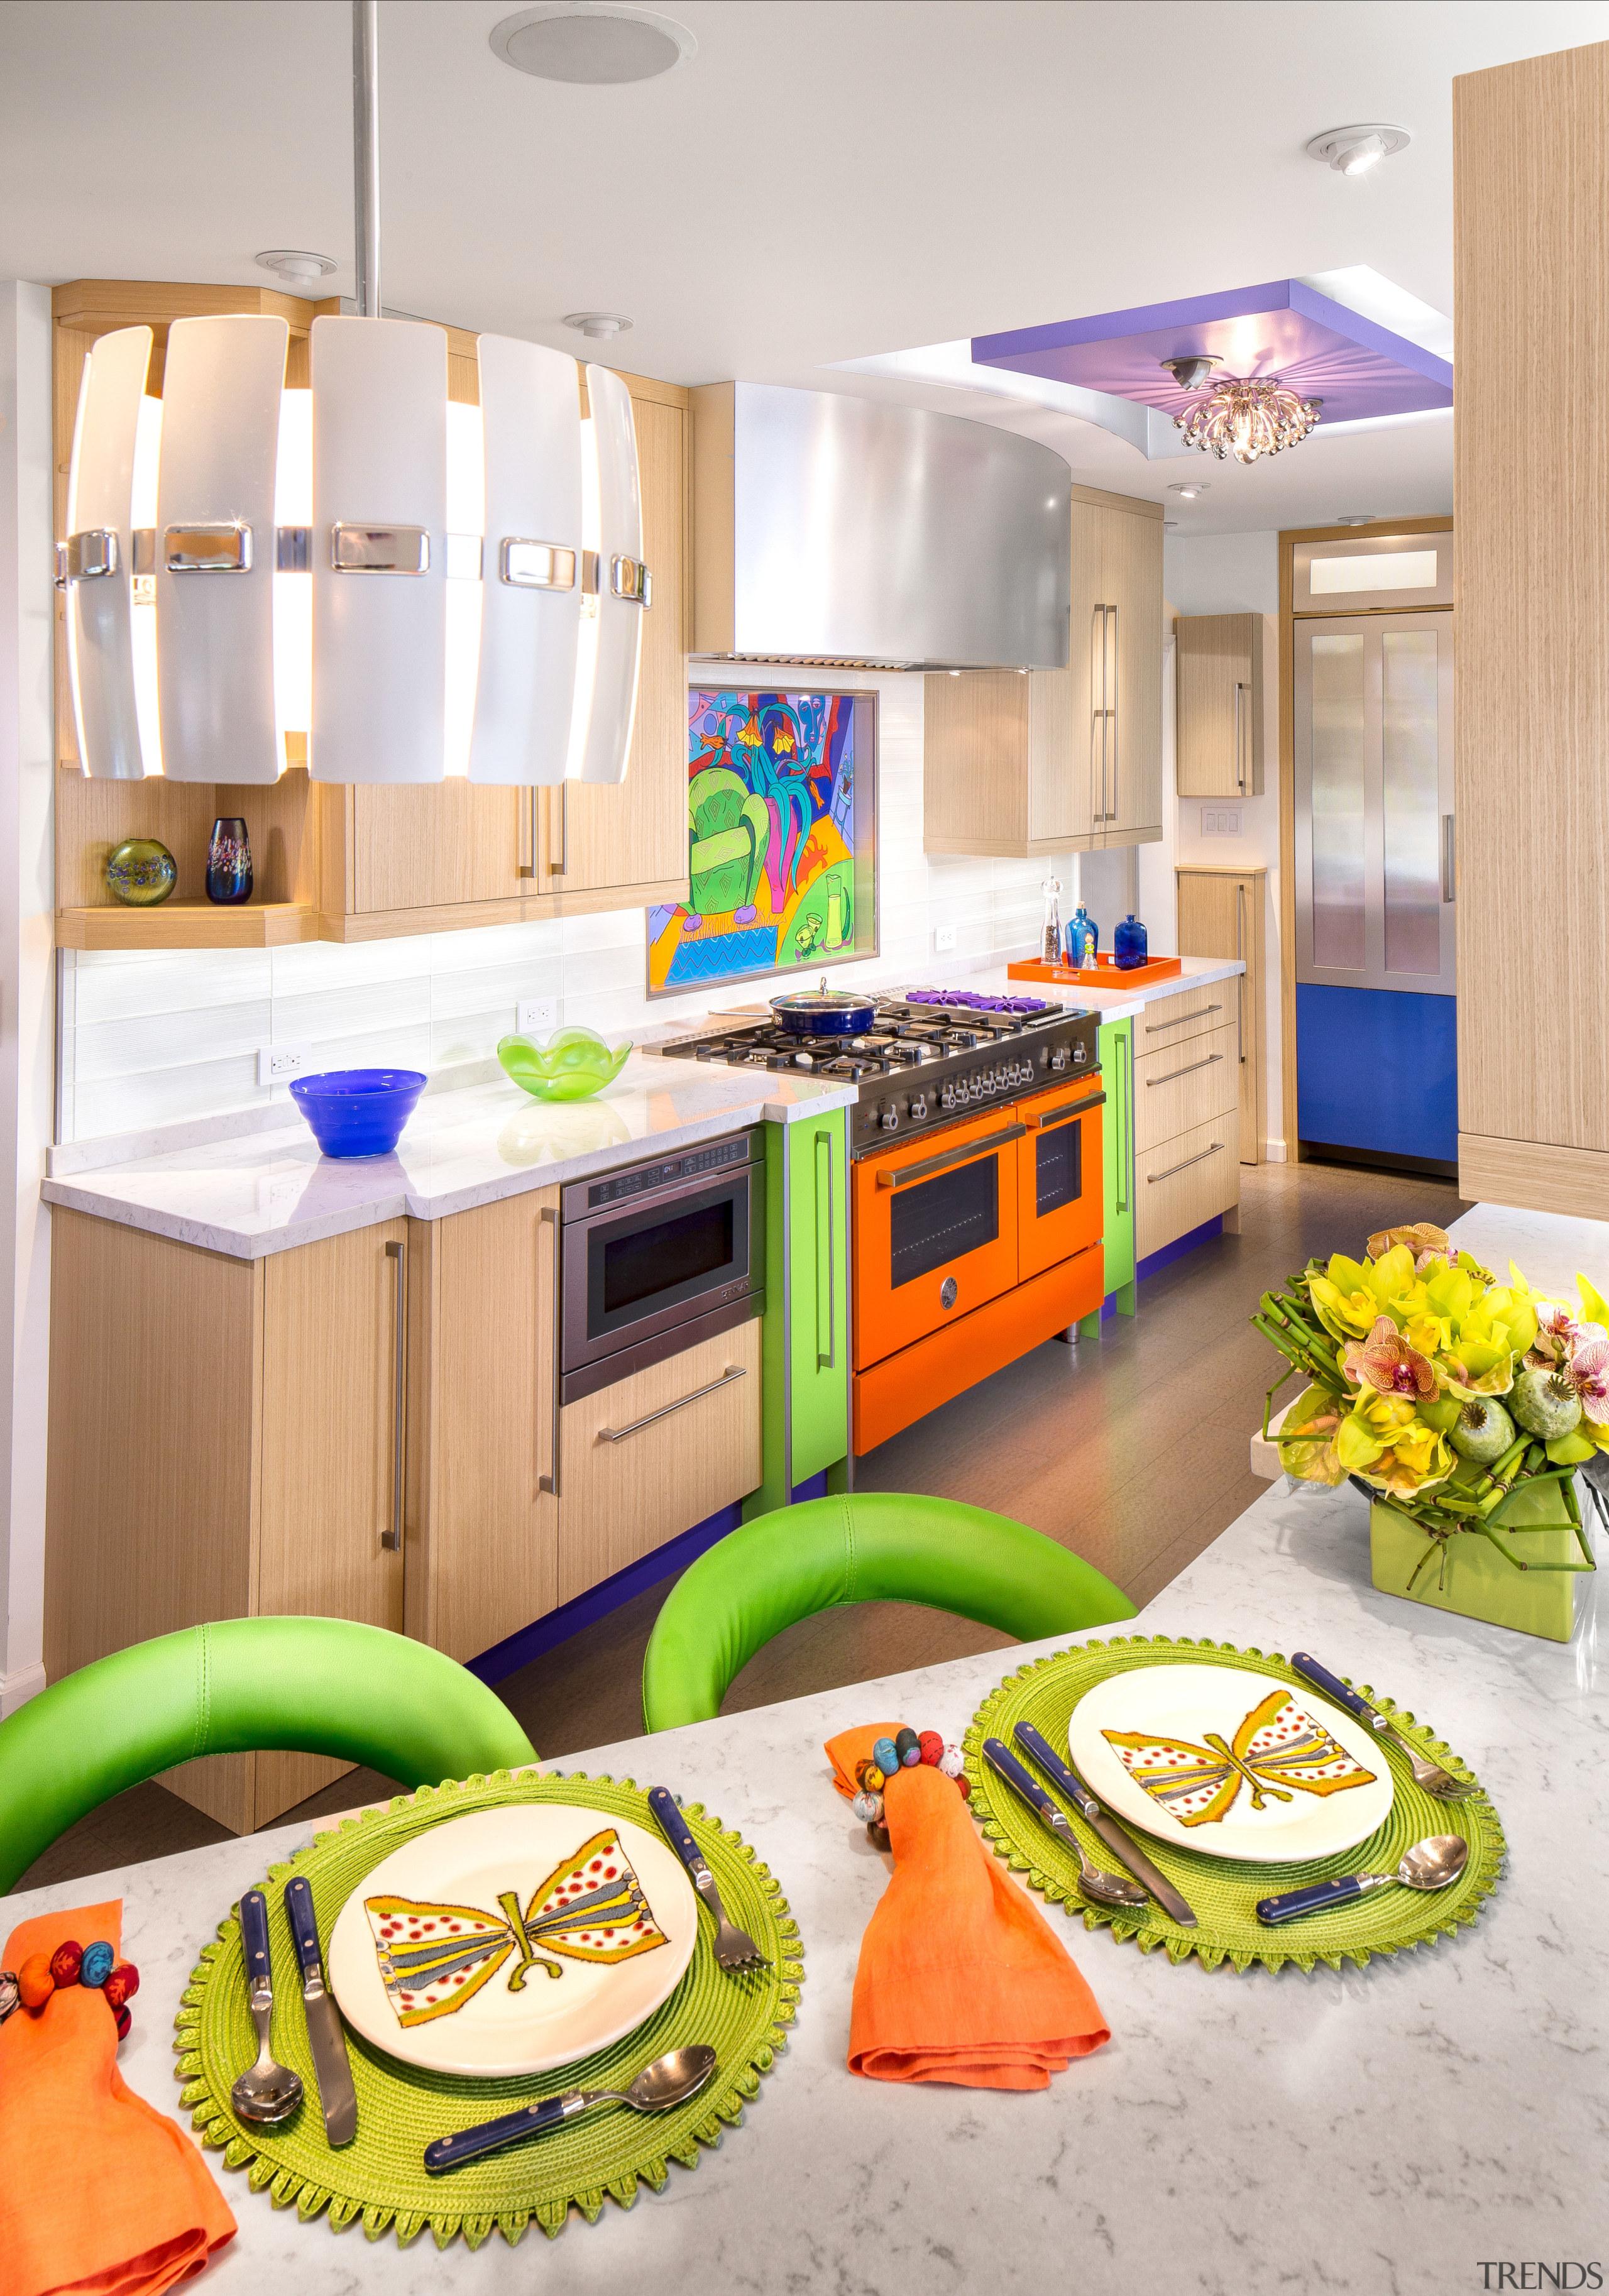 The calm neutral tones of rift-cut white oak countertop, interior design, kitchen, product, product design, room, white